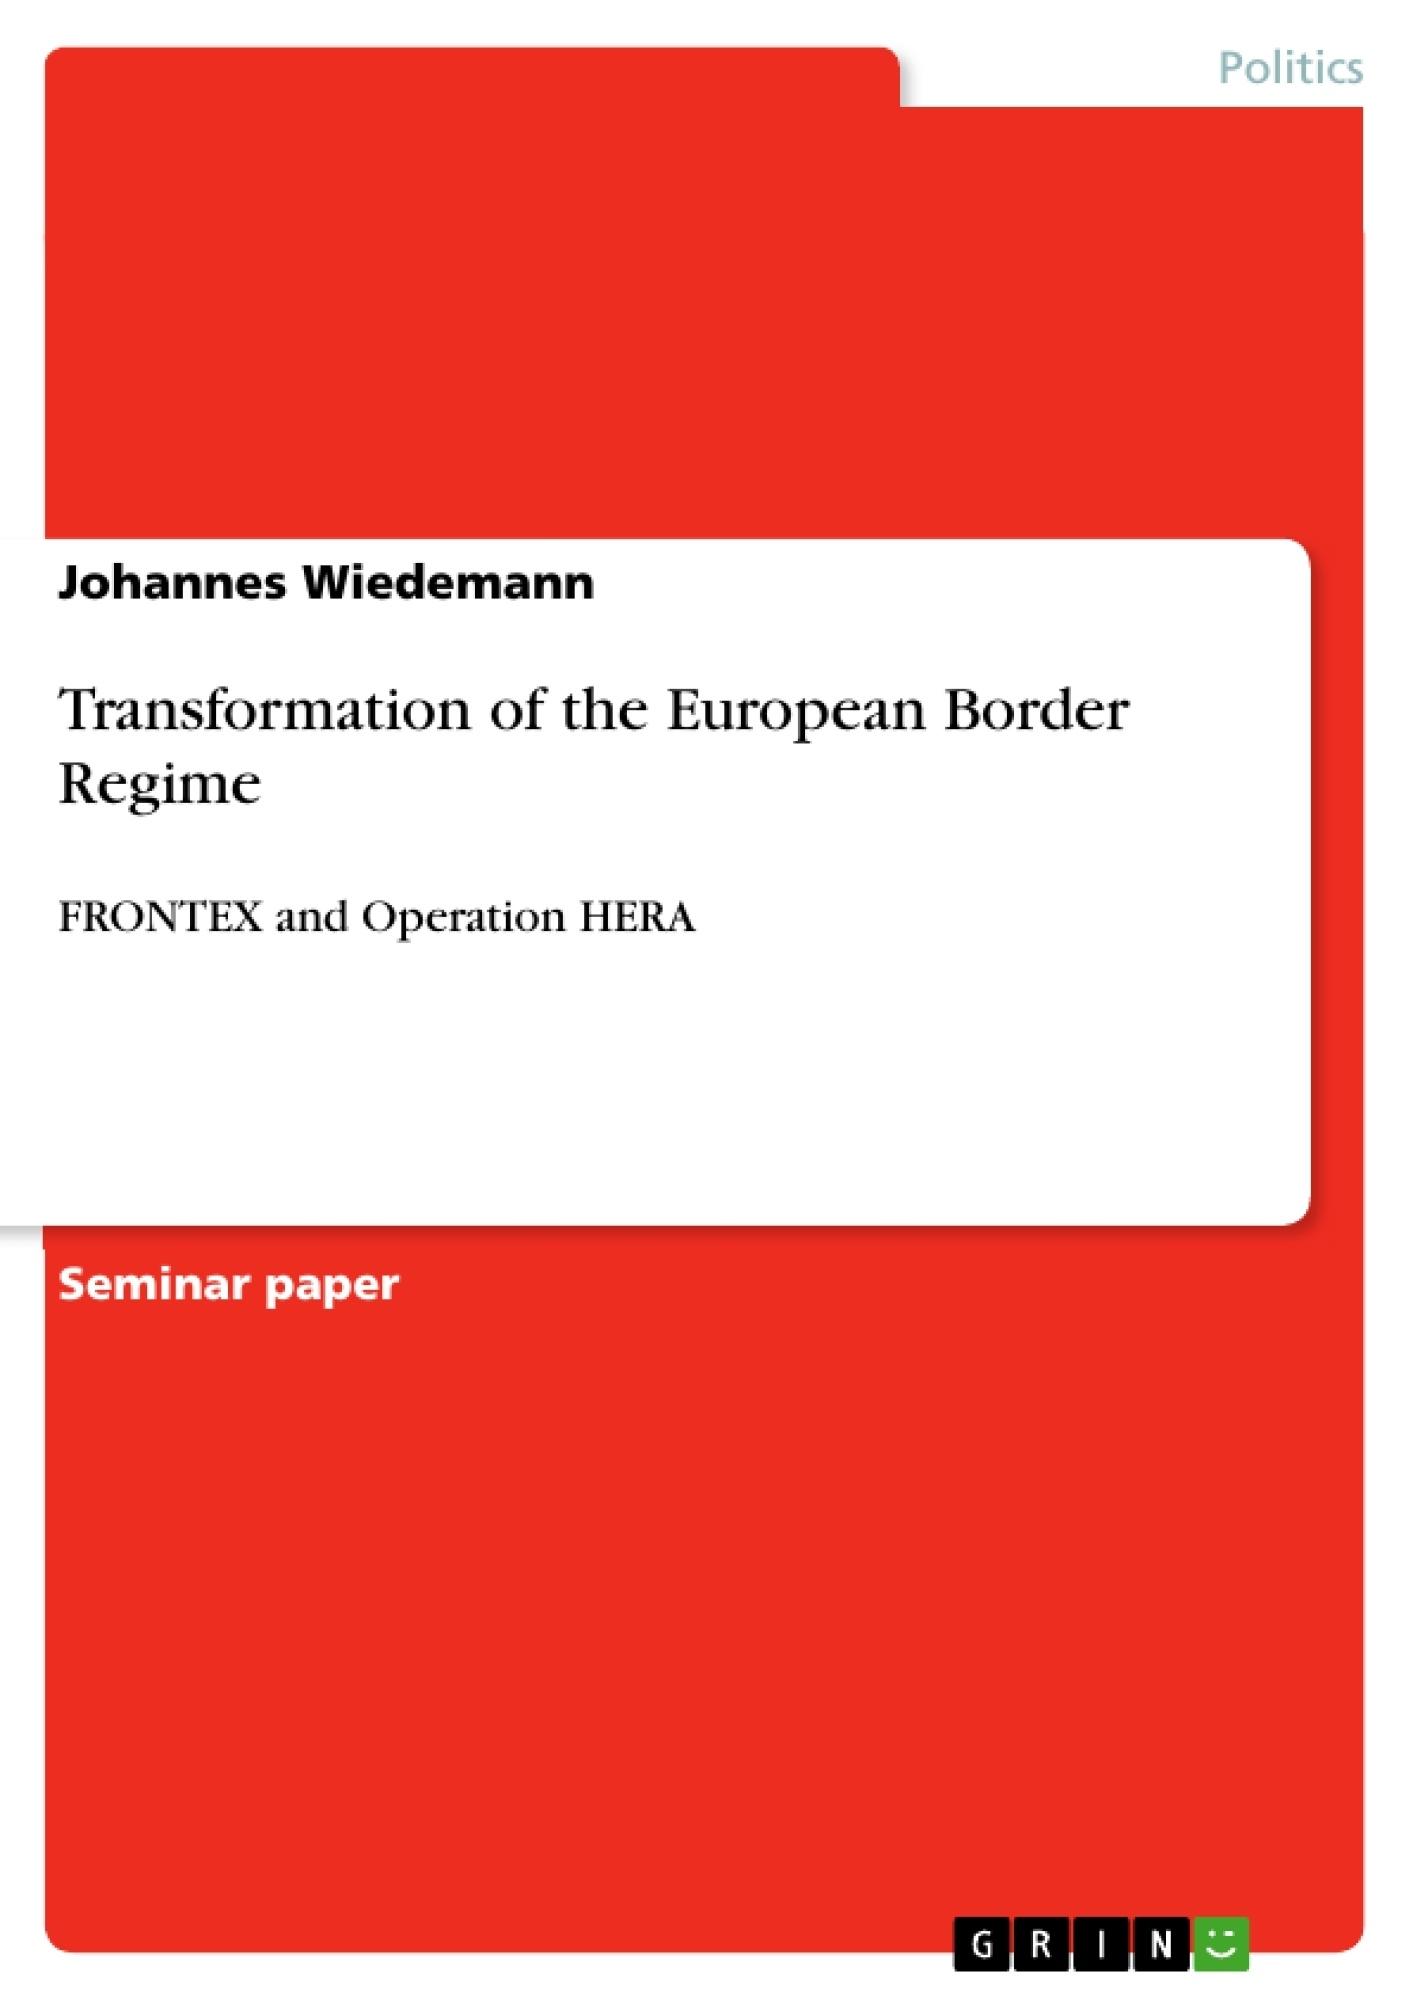 Title: Transformation of the European Border Regime